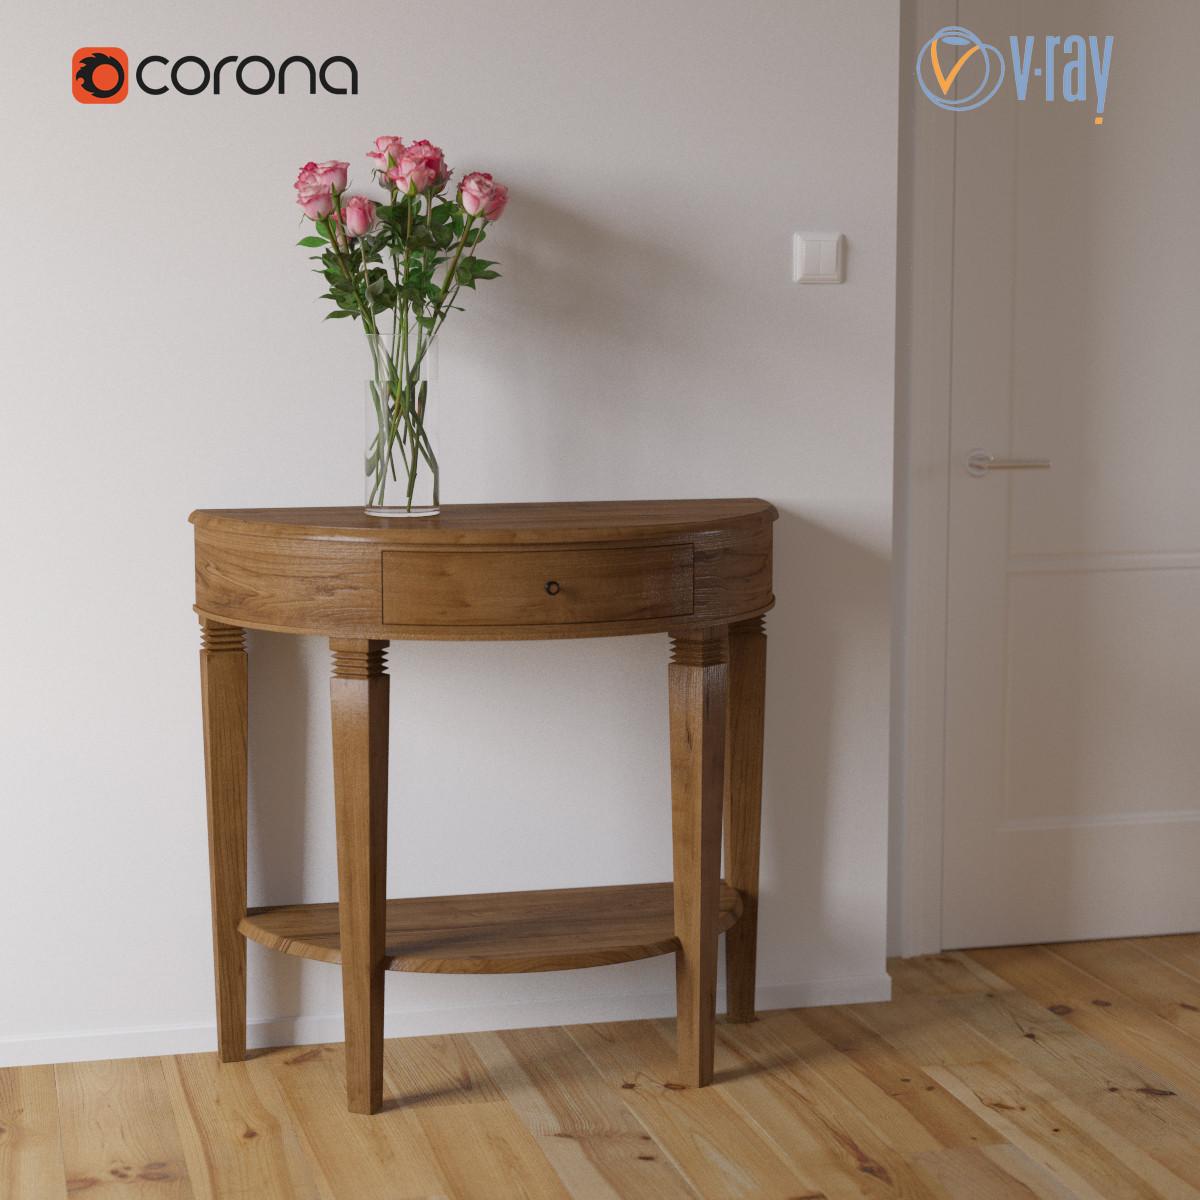 corona_01.jpg9efccca7-7c65-4f22-942a-c04d8fe3d248Original.jpg